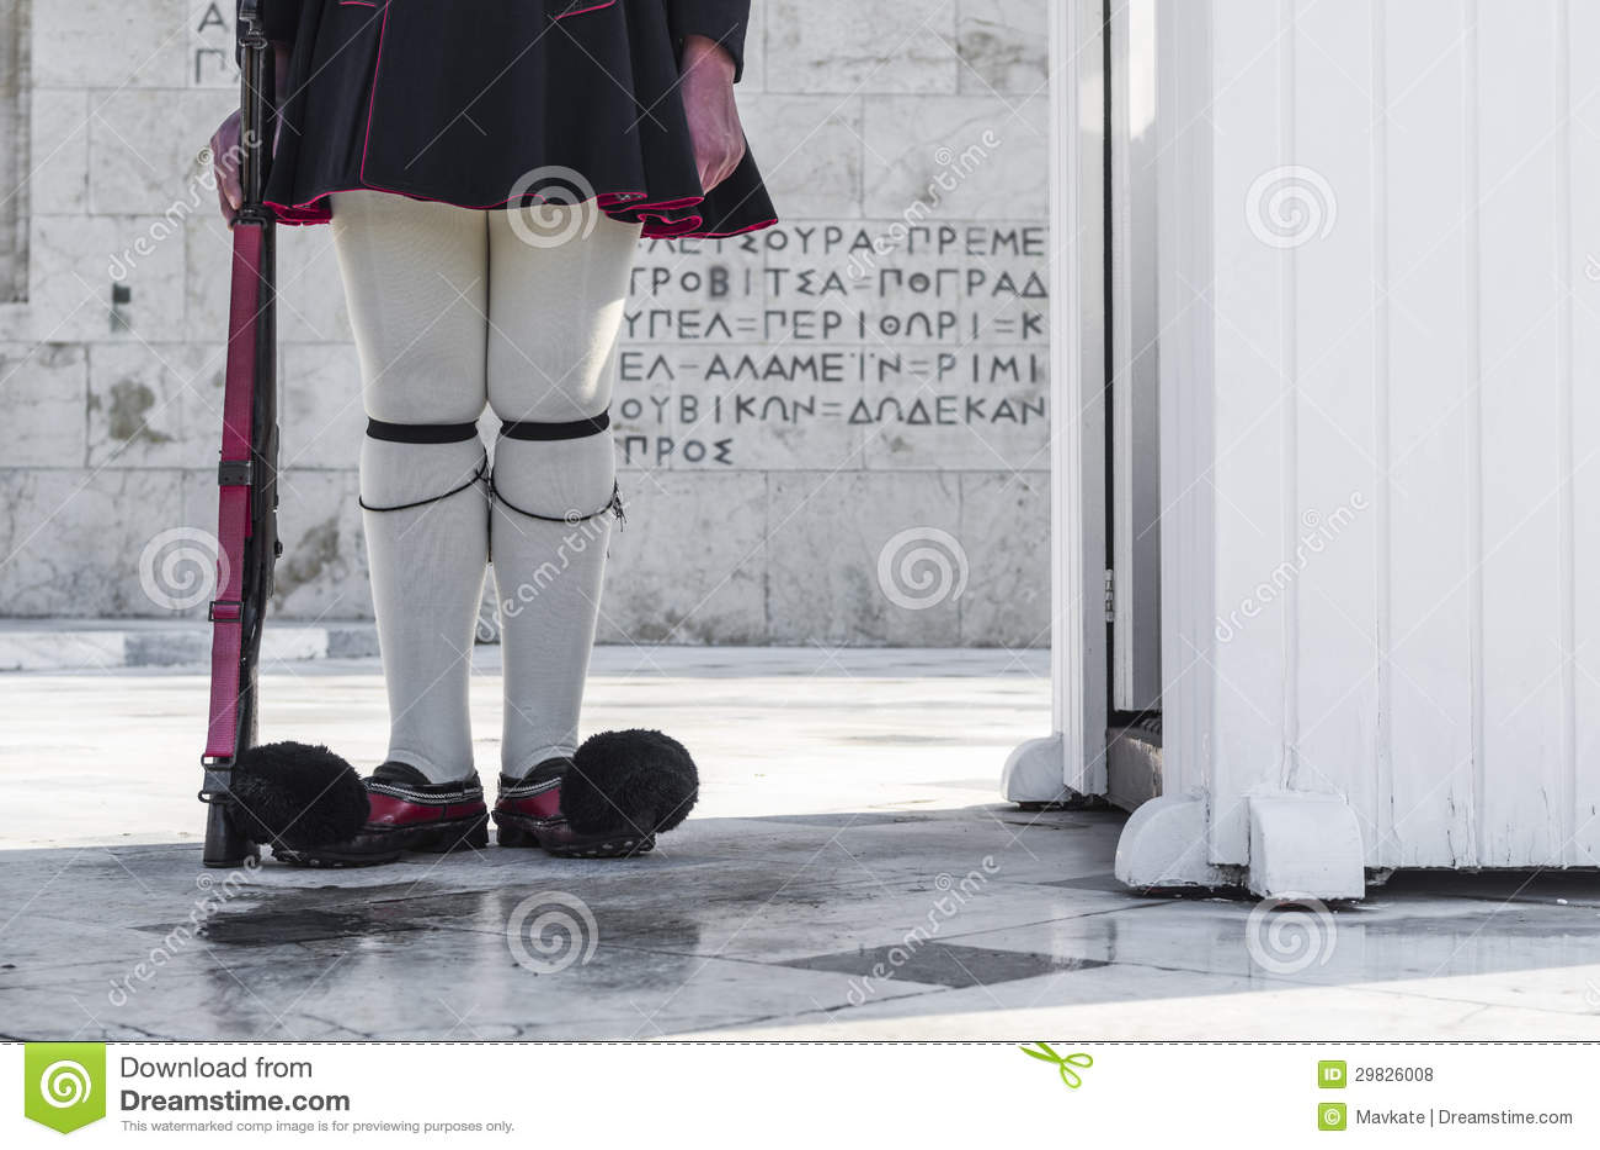 Evzone (protetor cerimonial presidencial) de Greece